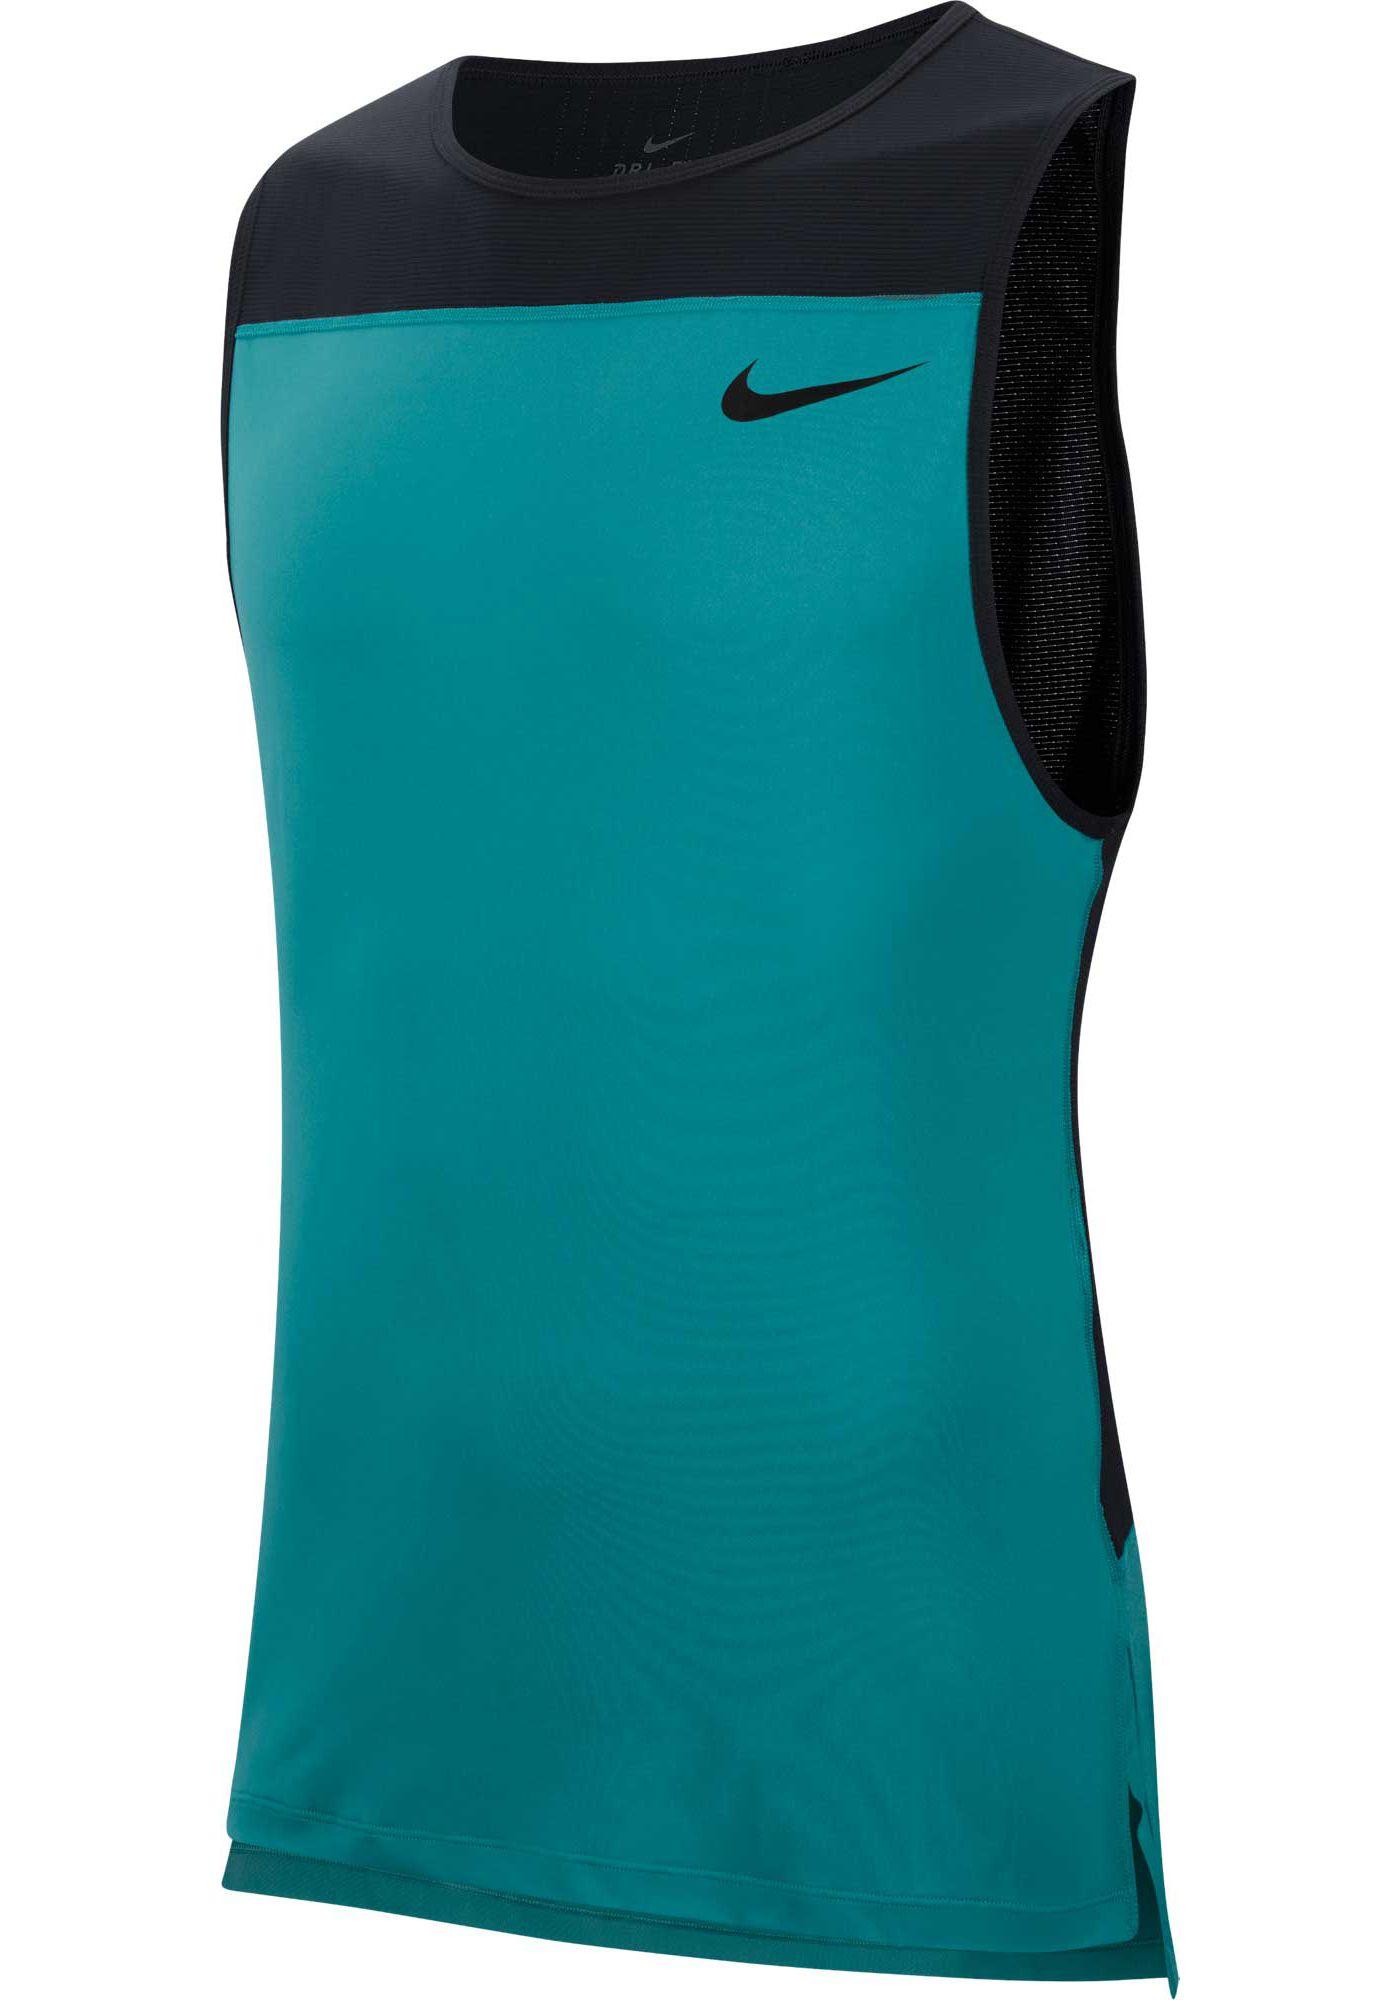 Nike Men's Pro Linear Vision Tank Top